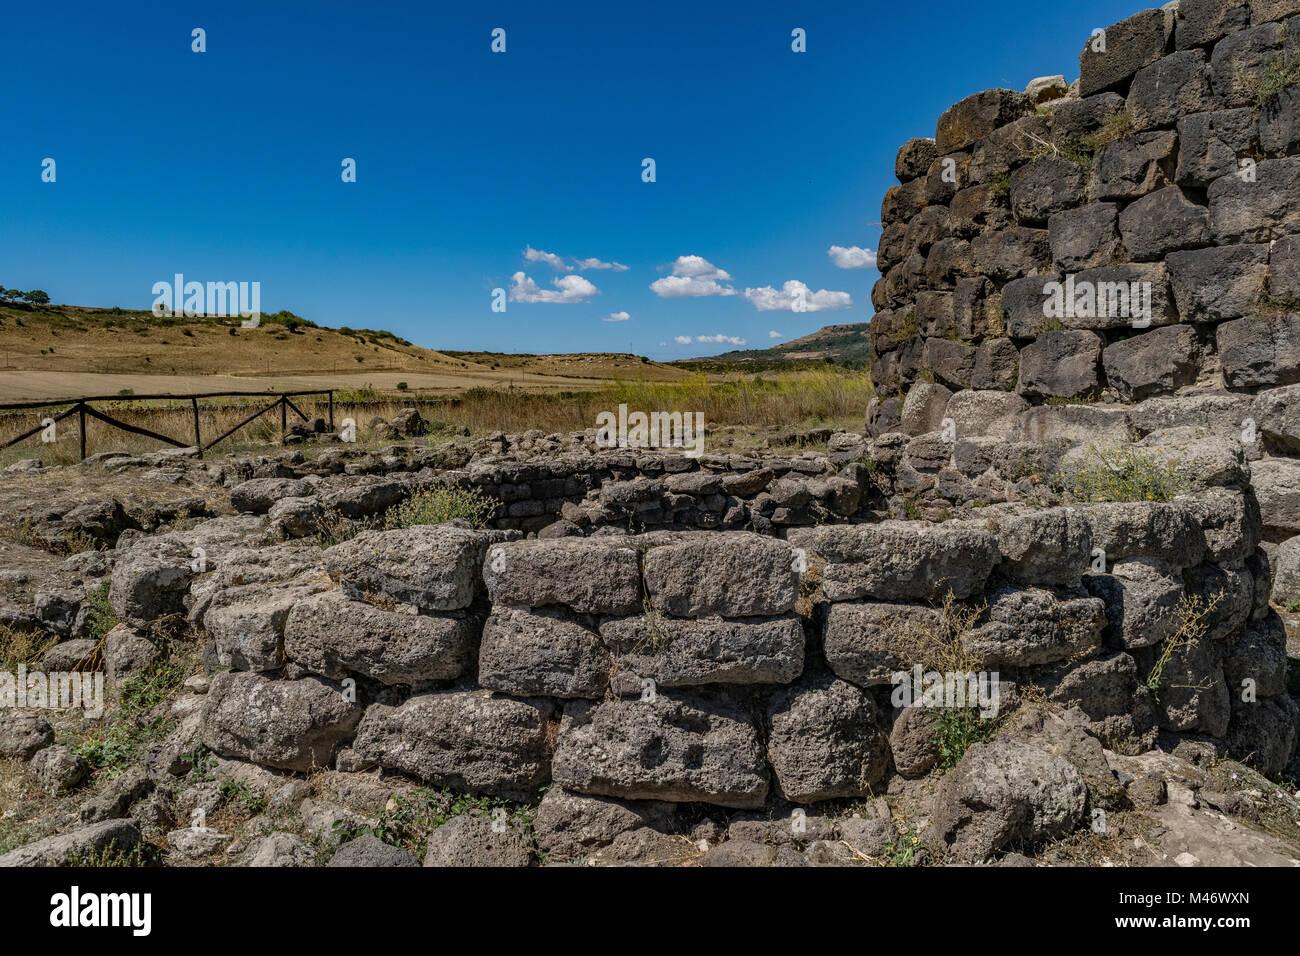 Nuraghe di Santu Antine, Torralba, Sardinia, Italy - Stock Image